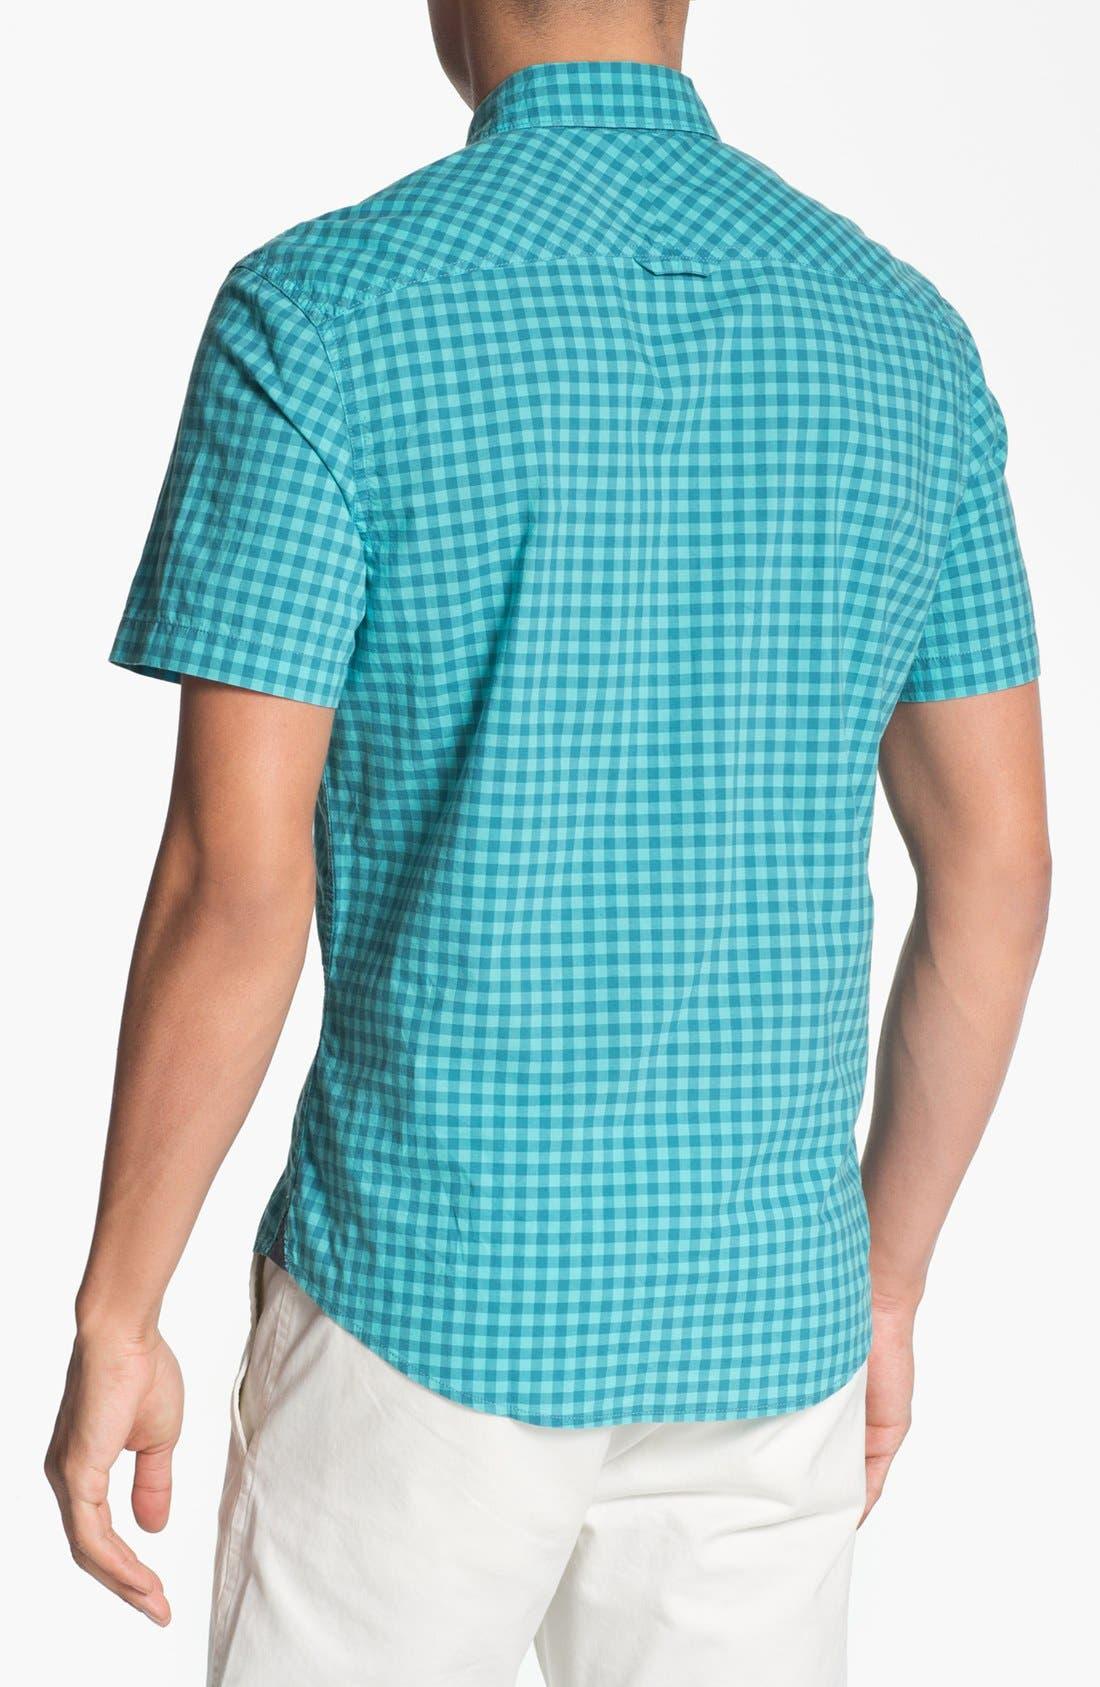 Alternate Image 3  - 1901 Plaid Short Sleeve Woven Shirt